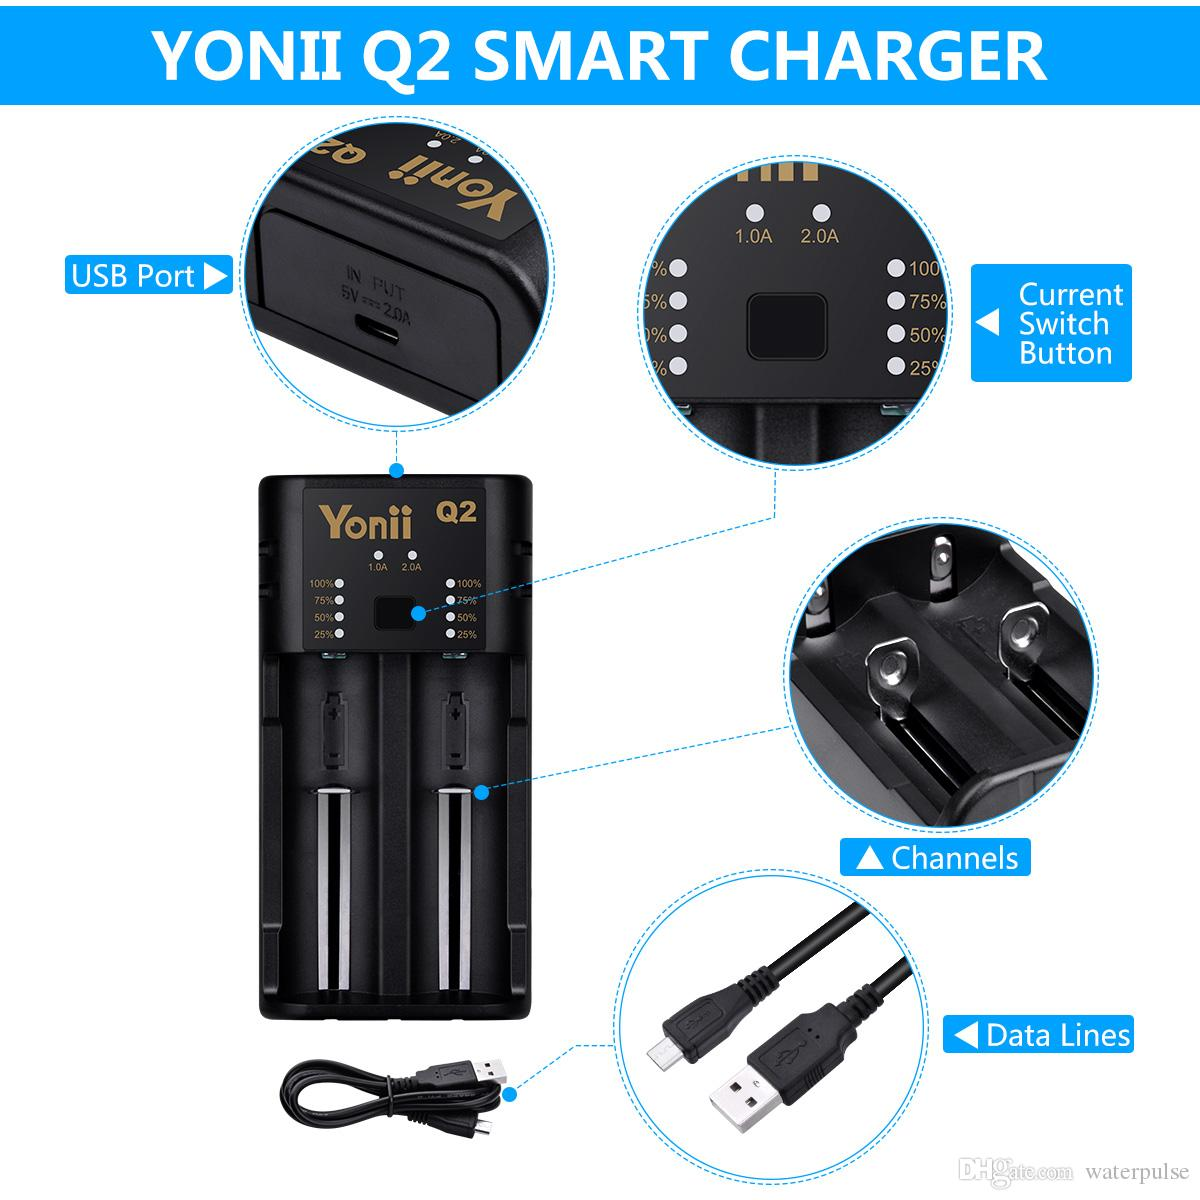 Electro Battery Charger 범용 스마트 충전기 지능형 충전식 배터리 Ni-MH Ni-Cd Li-IMR 10440 14500 16340 18650